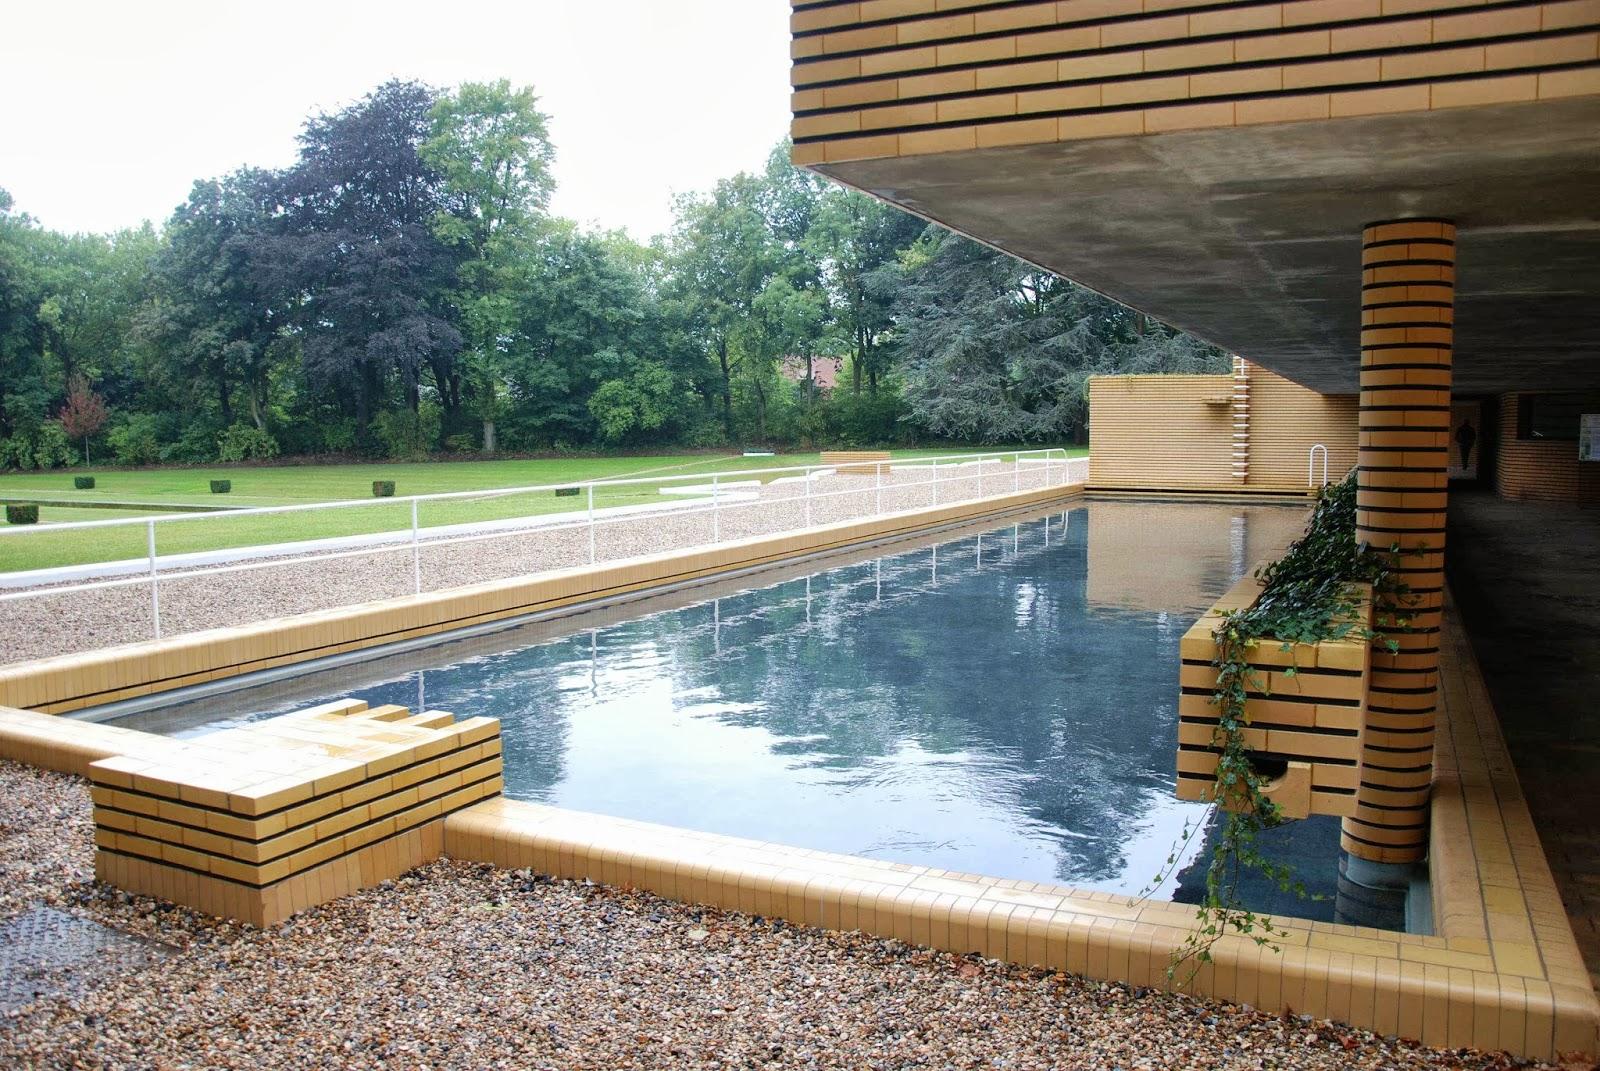 le blog des amis de la villa cavrois le bassin de natation. Black Bedroom Furniture Sets. Home Design Ideas